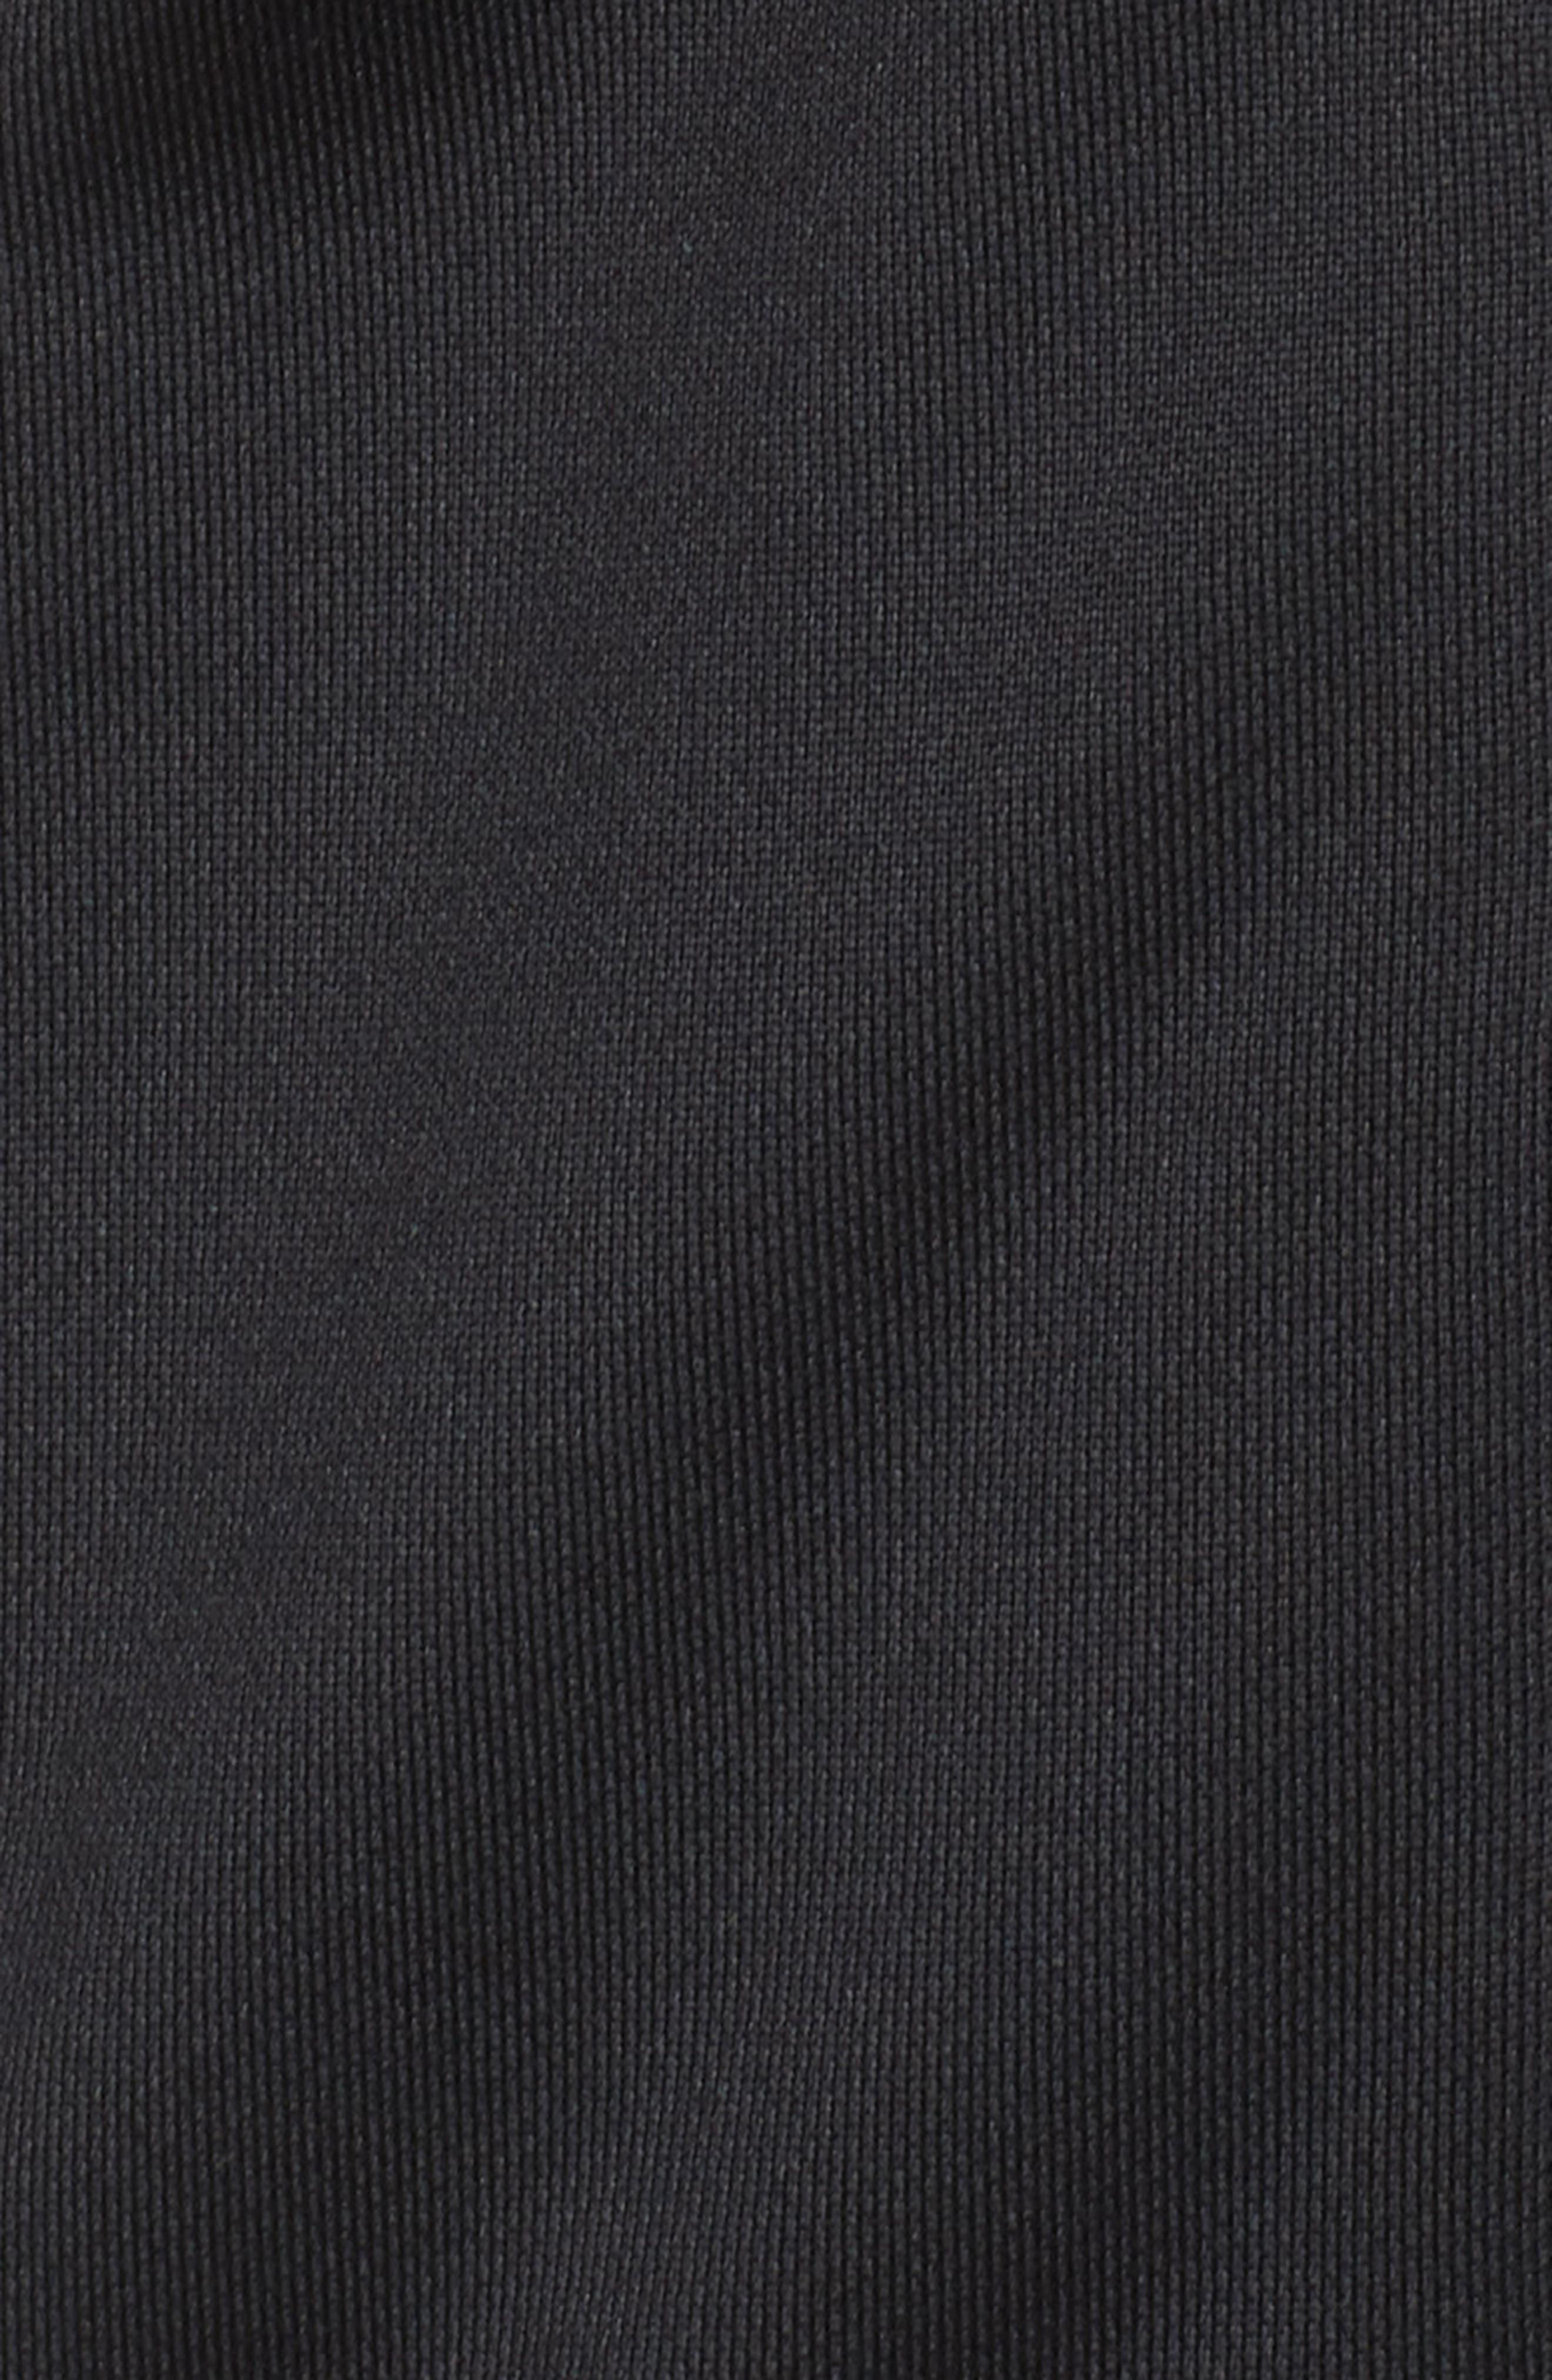 Retro Track Jacket,                             Alternate thumbnail 5, color,                             PUMA BLACK